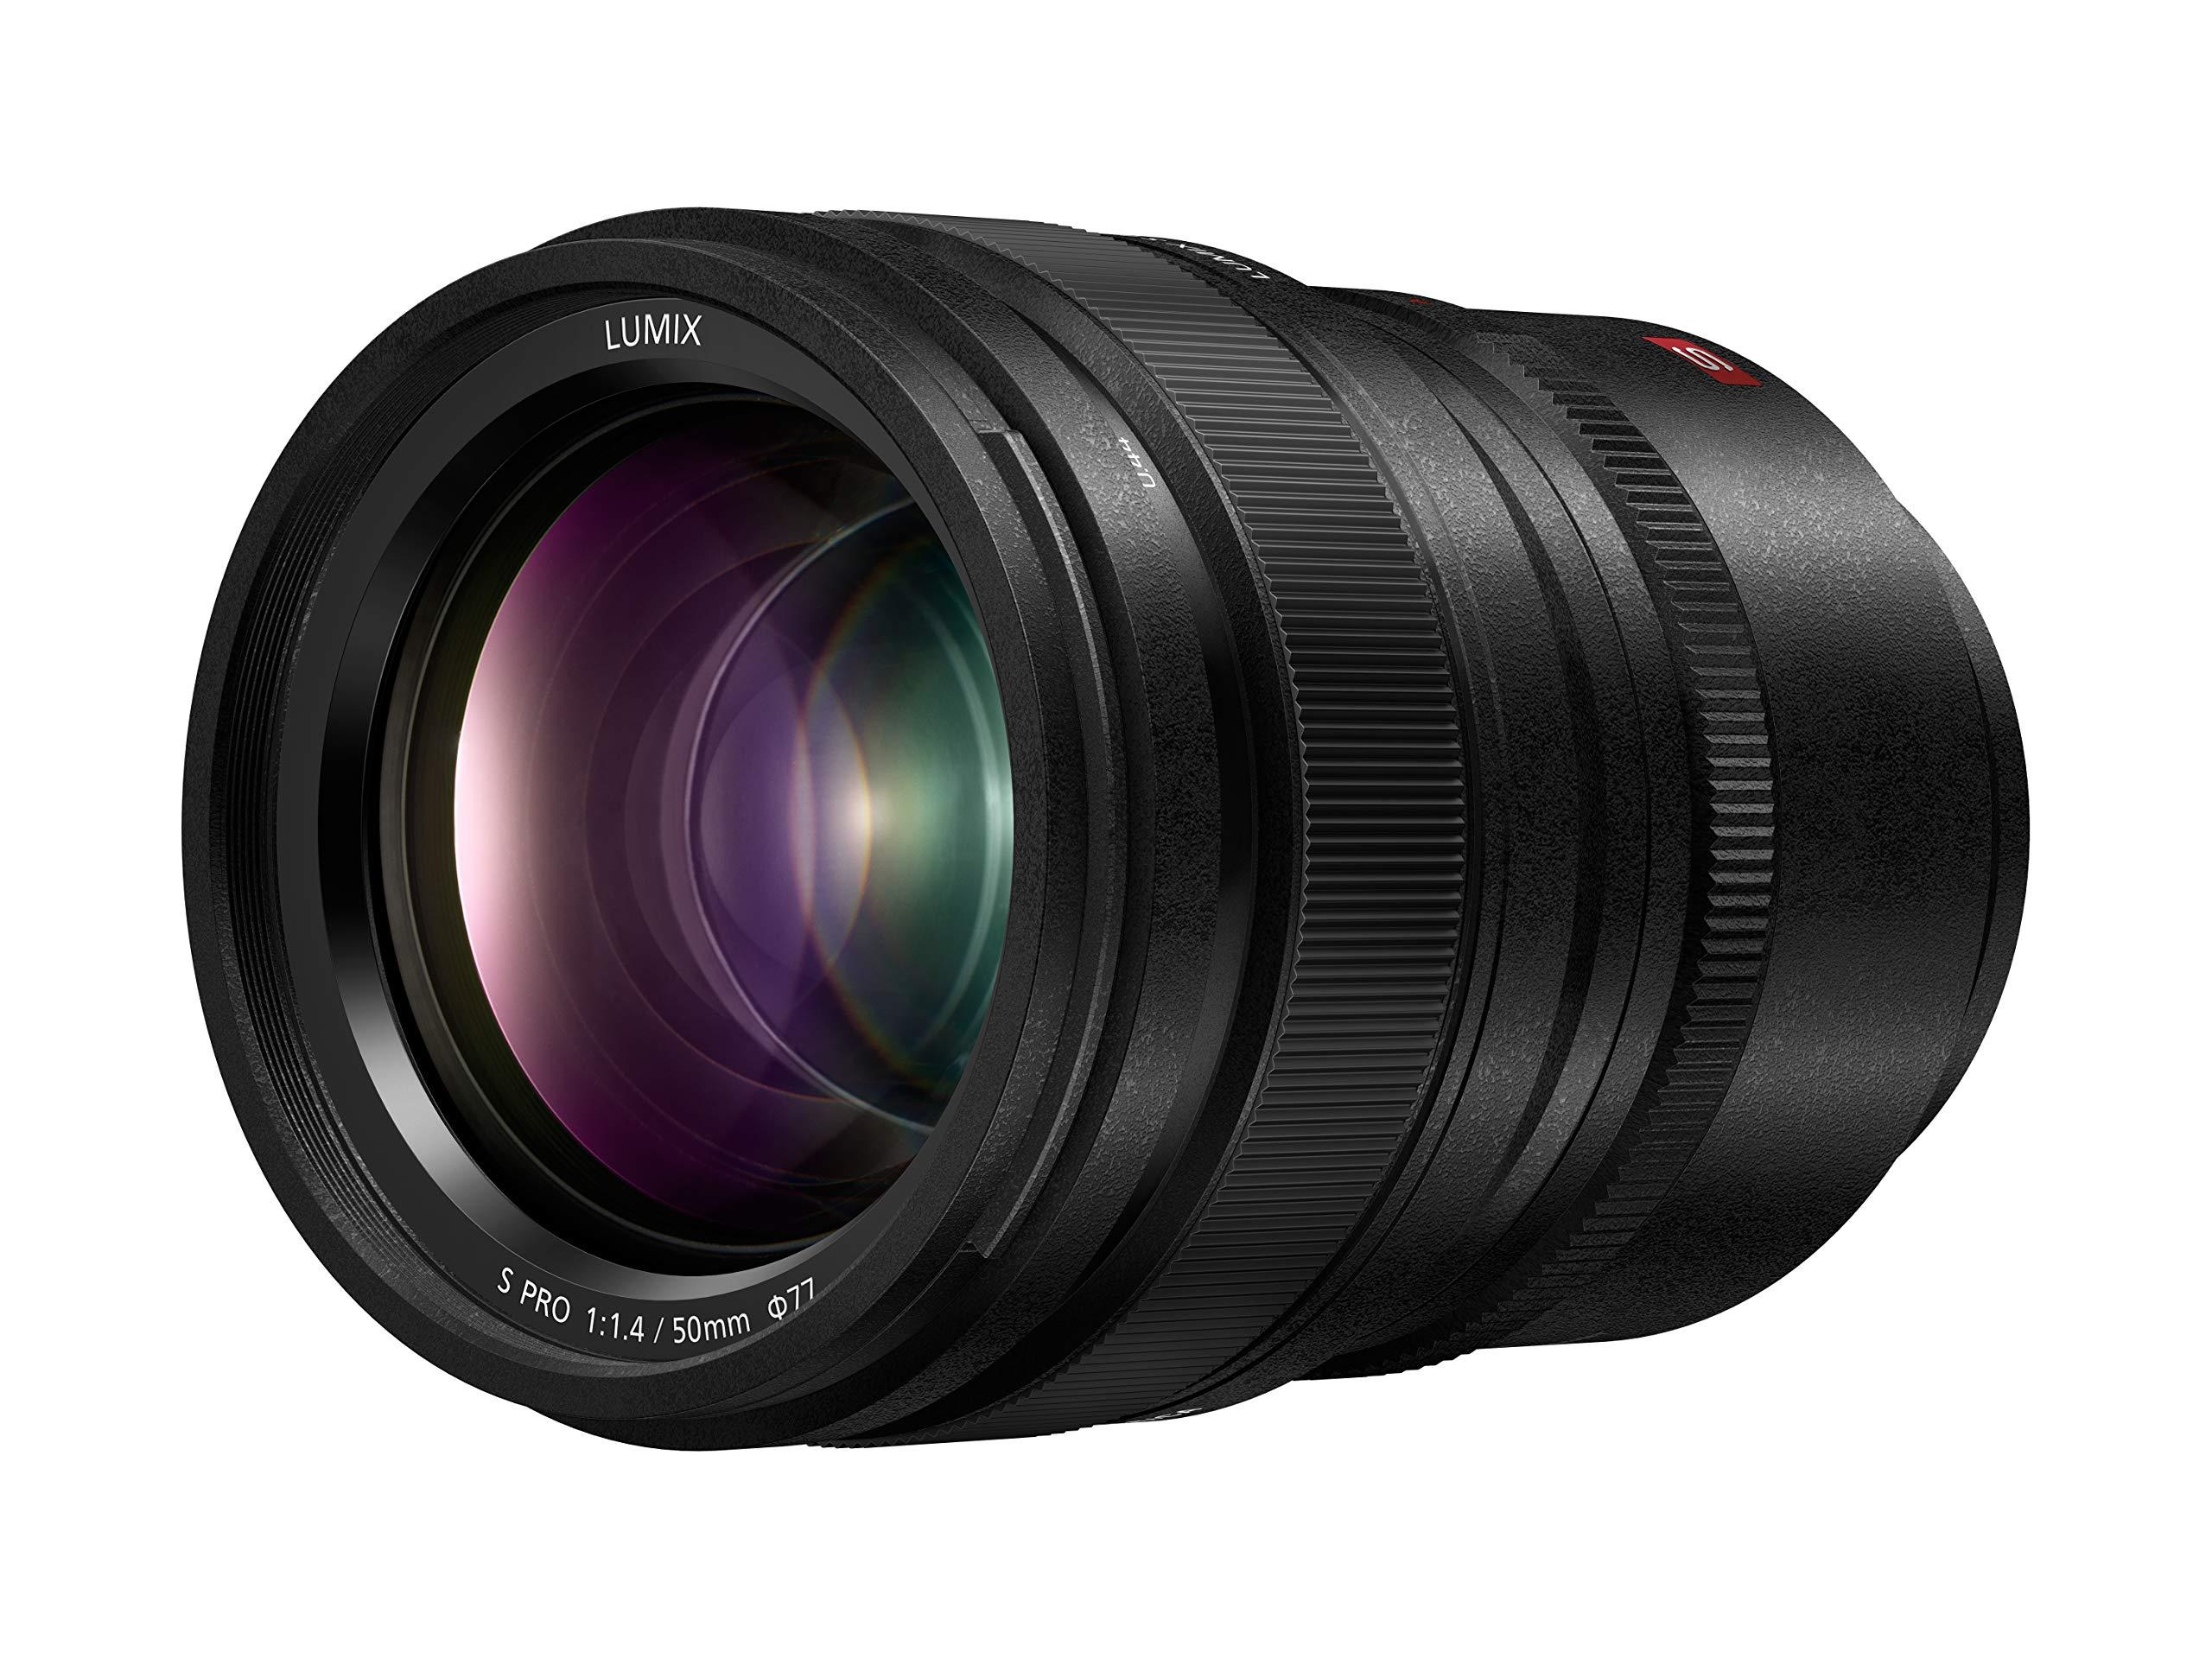 Panasonic LUMIX S PRO 50mm F1.4 Lens, Full-Frame L Mount, Leica Certified, Dust/Splash/Freeze-Resistant for Panasonic LUMIX S Series Mirrorless Cameras - S-X50 (USA) by Panasonic